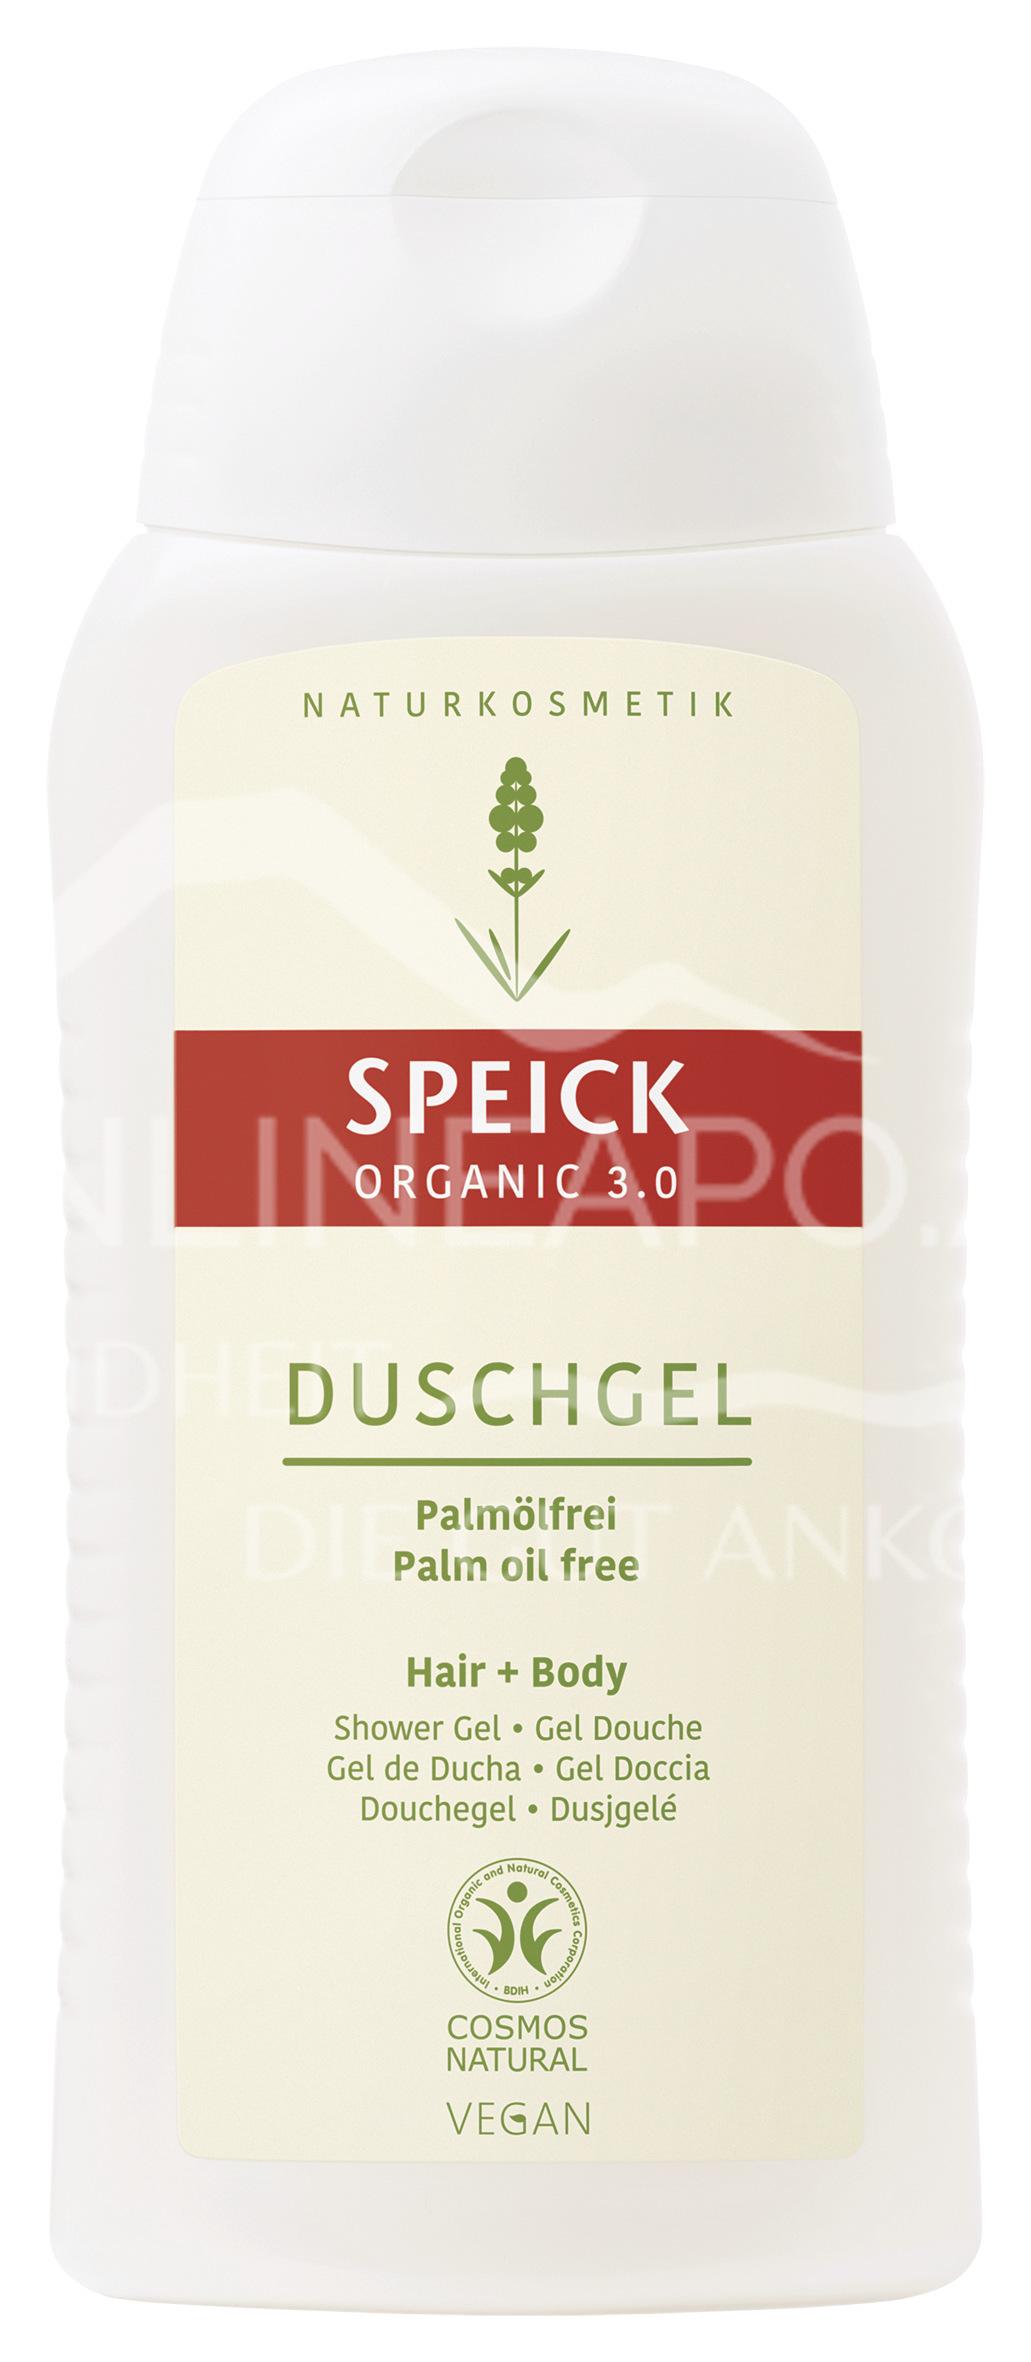 Speick Organic 3.0 Duschgel